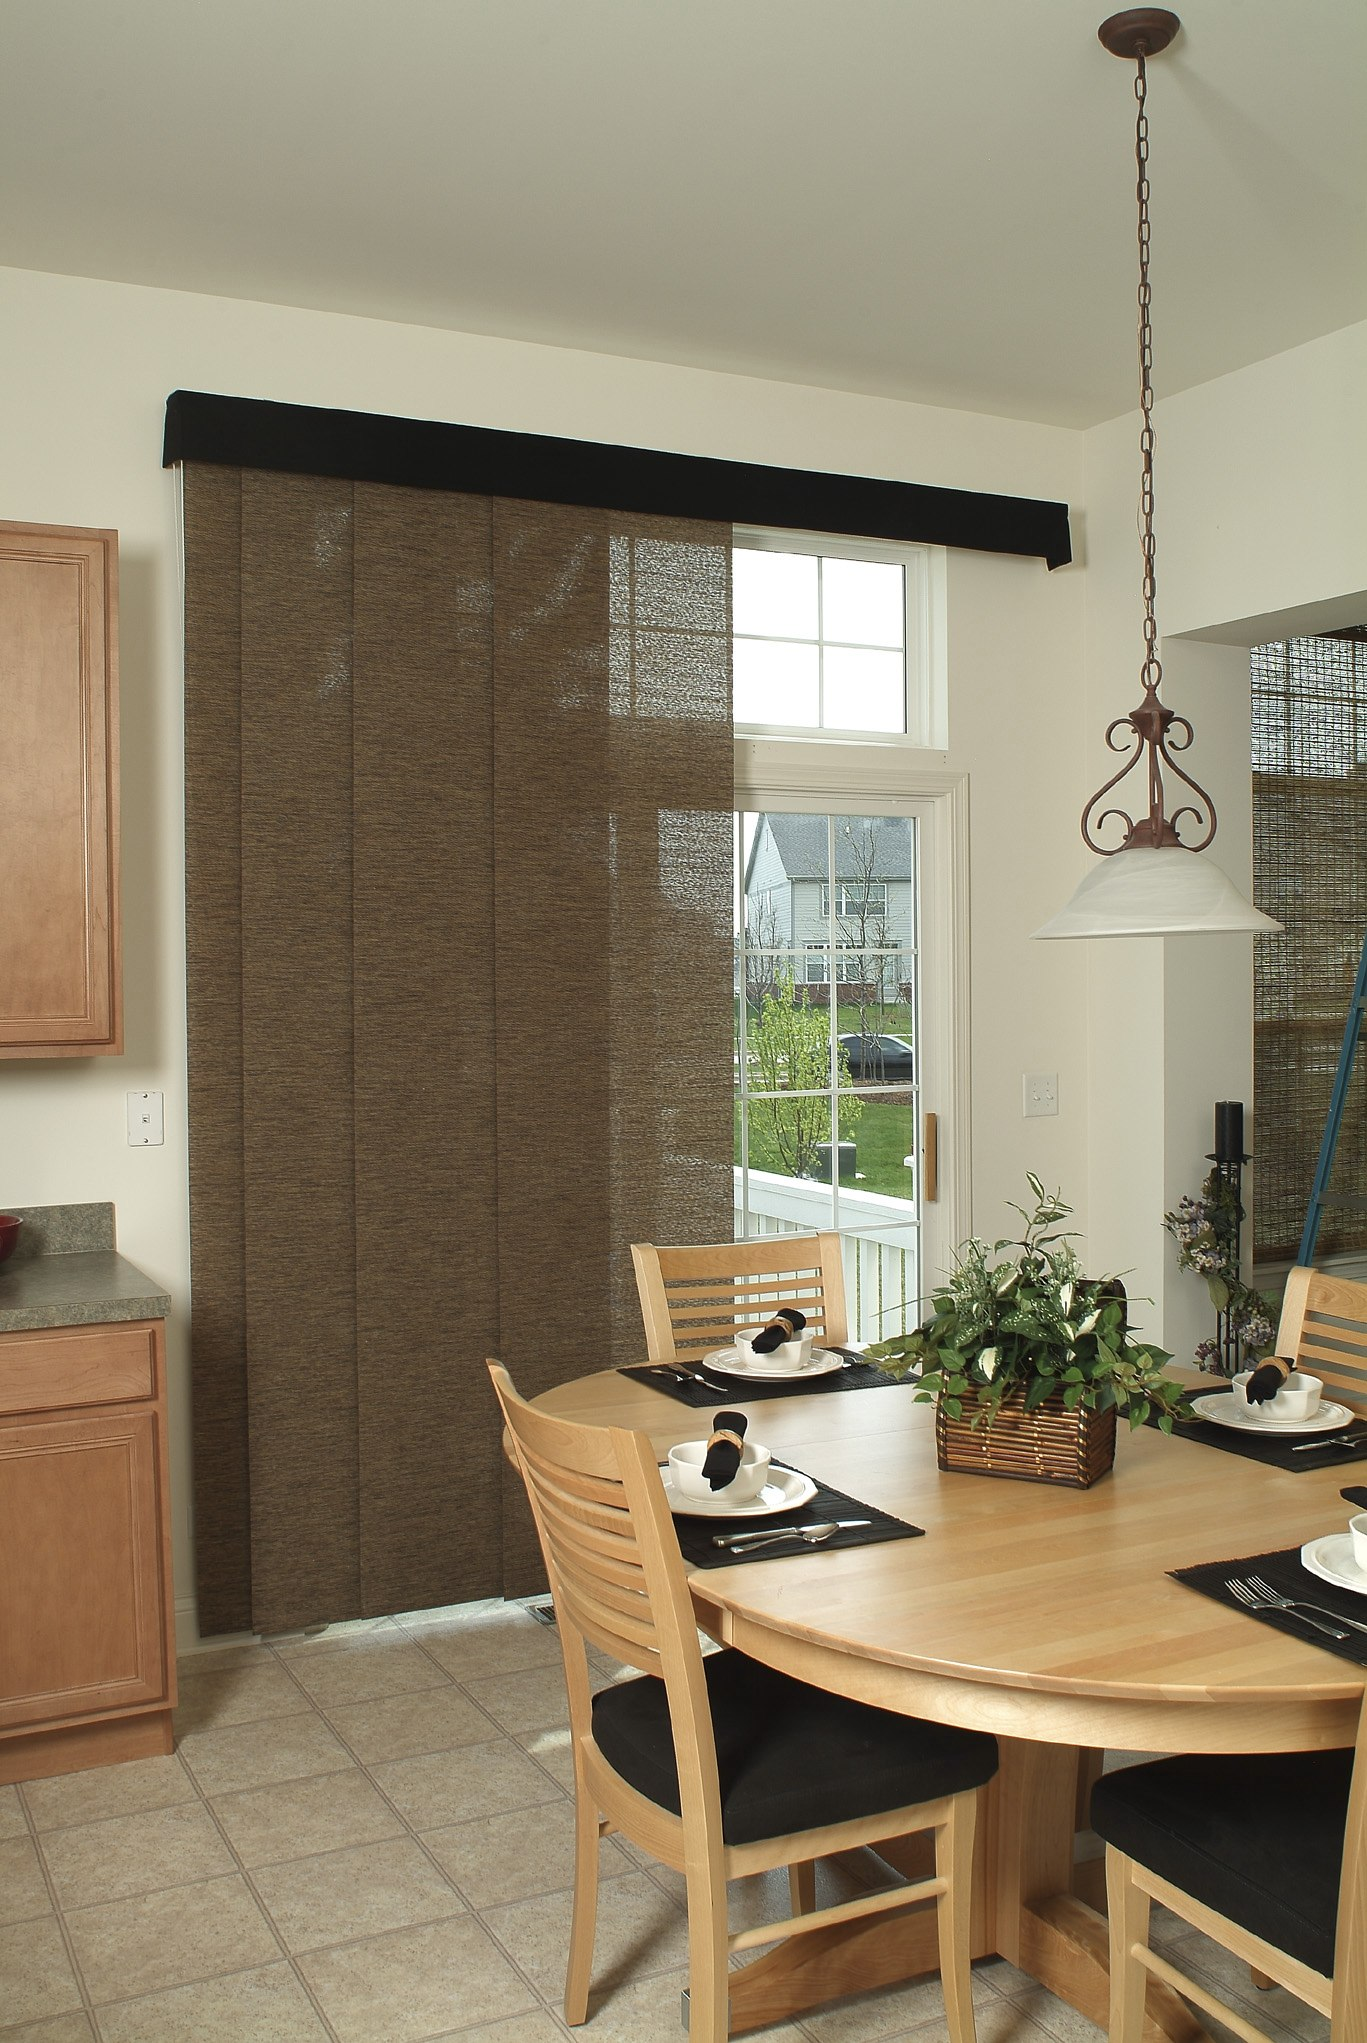 villa 39 s elance sliding panels from horizon villa blind and shutter. Black Bedroom Furniture Sets. Home Design Ideas